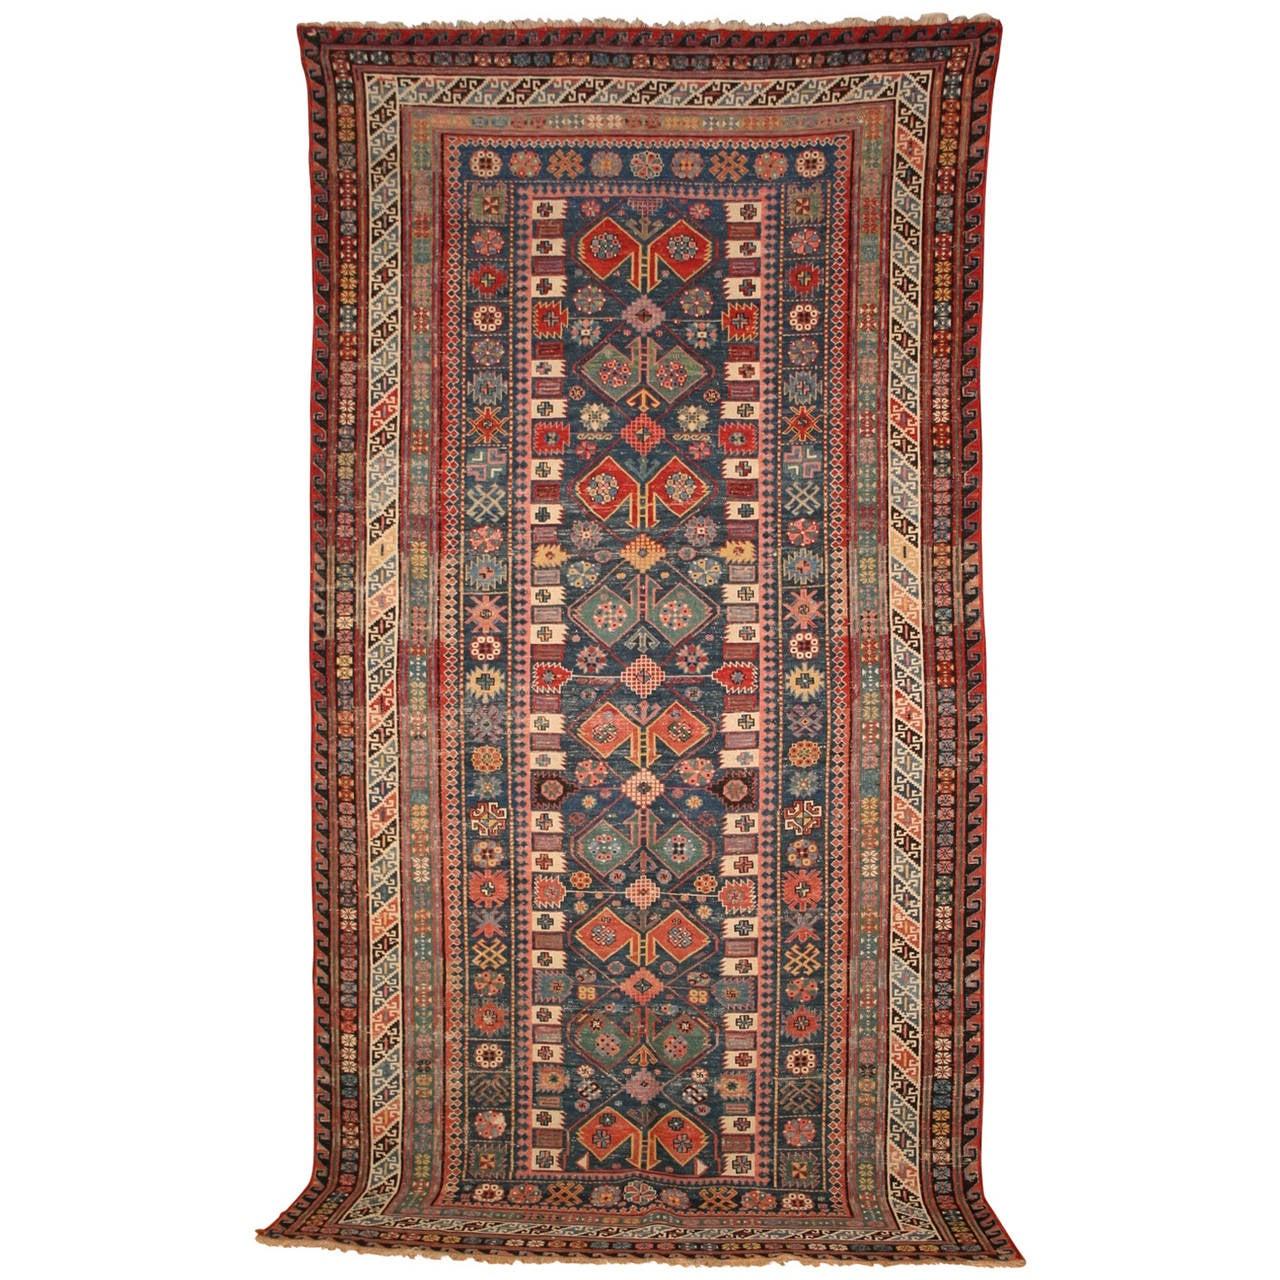 Armenian Antique Rugs: Rare Antique Armenian Soumak Rug At 1stdibs